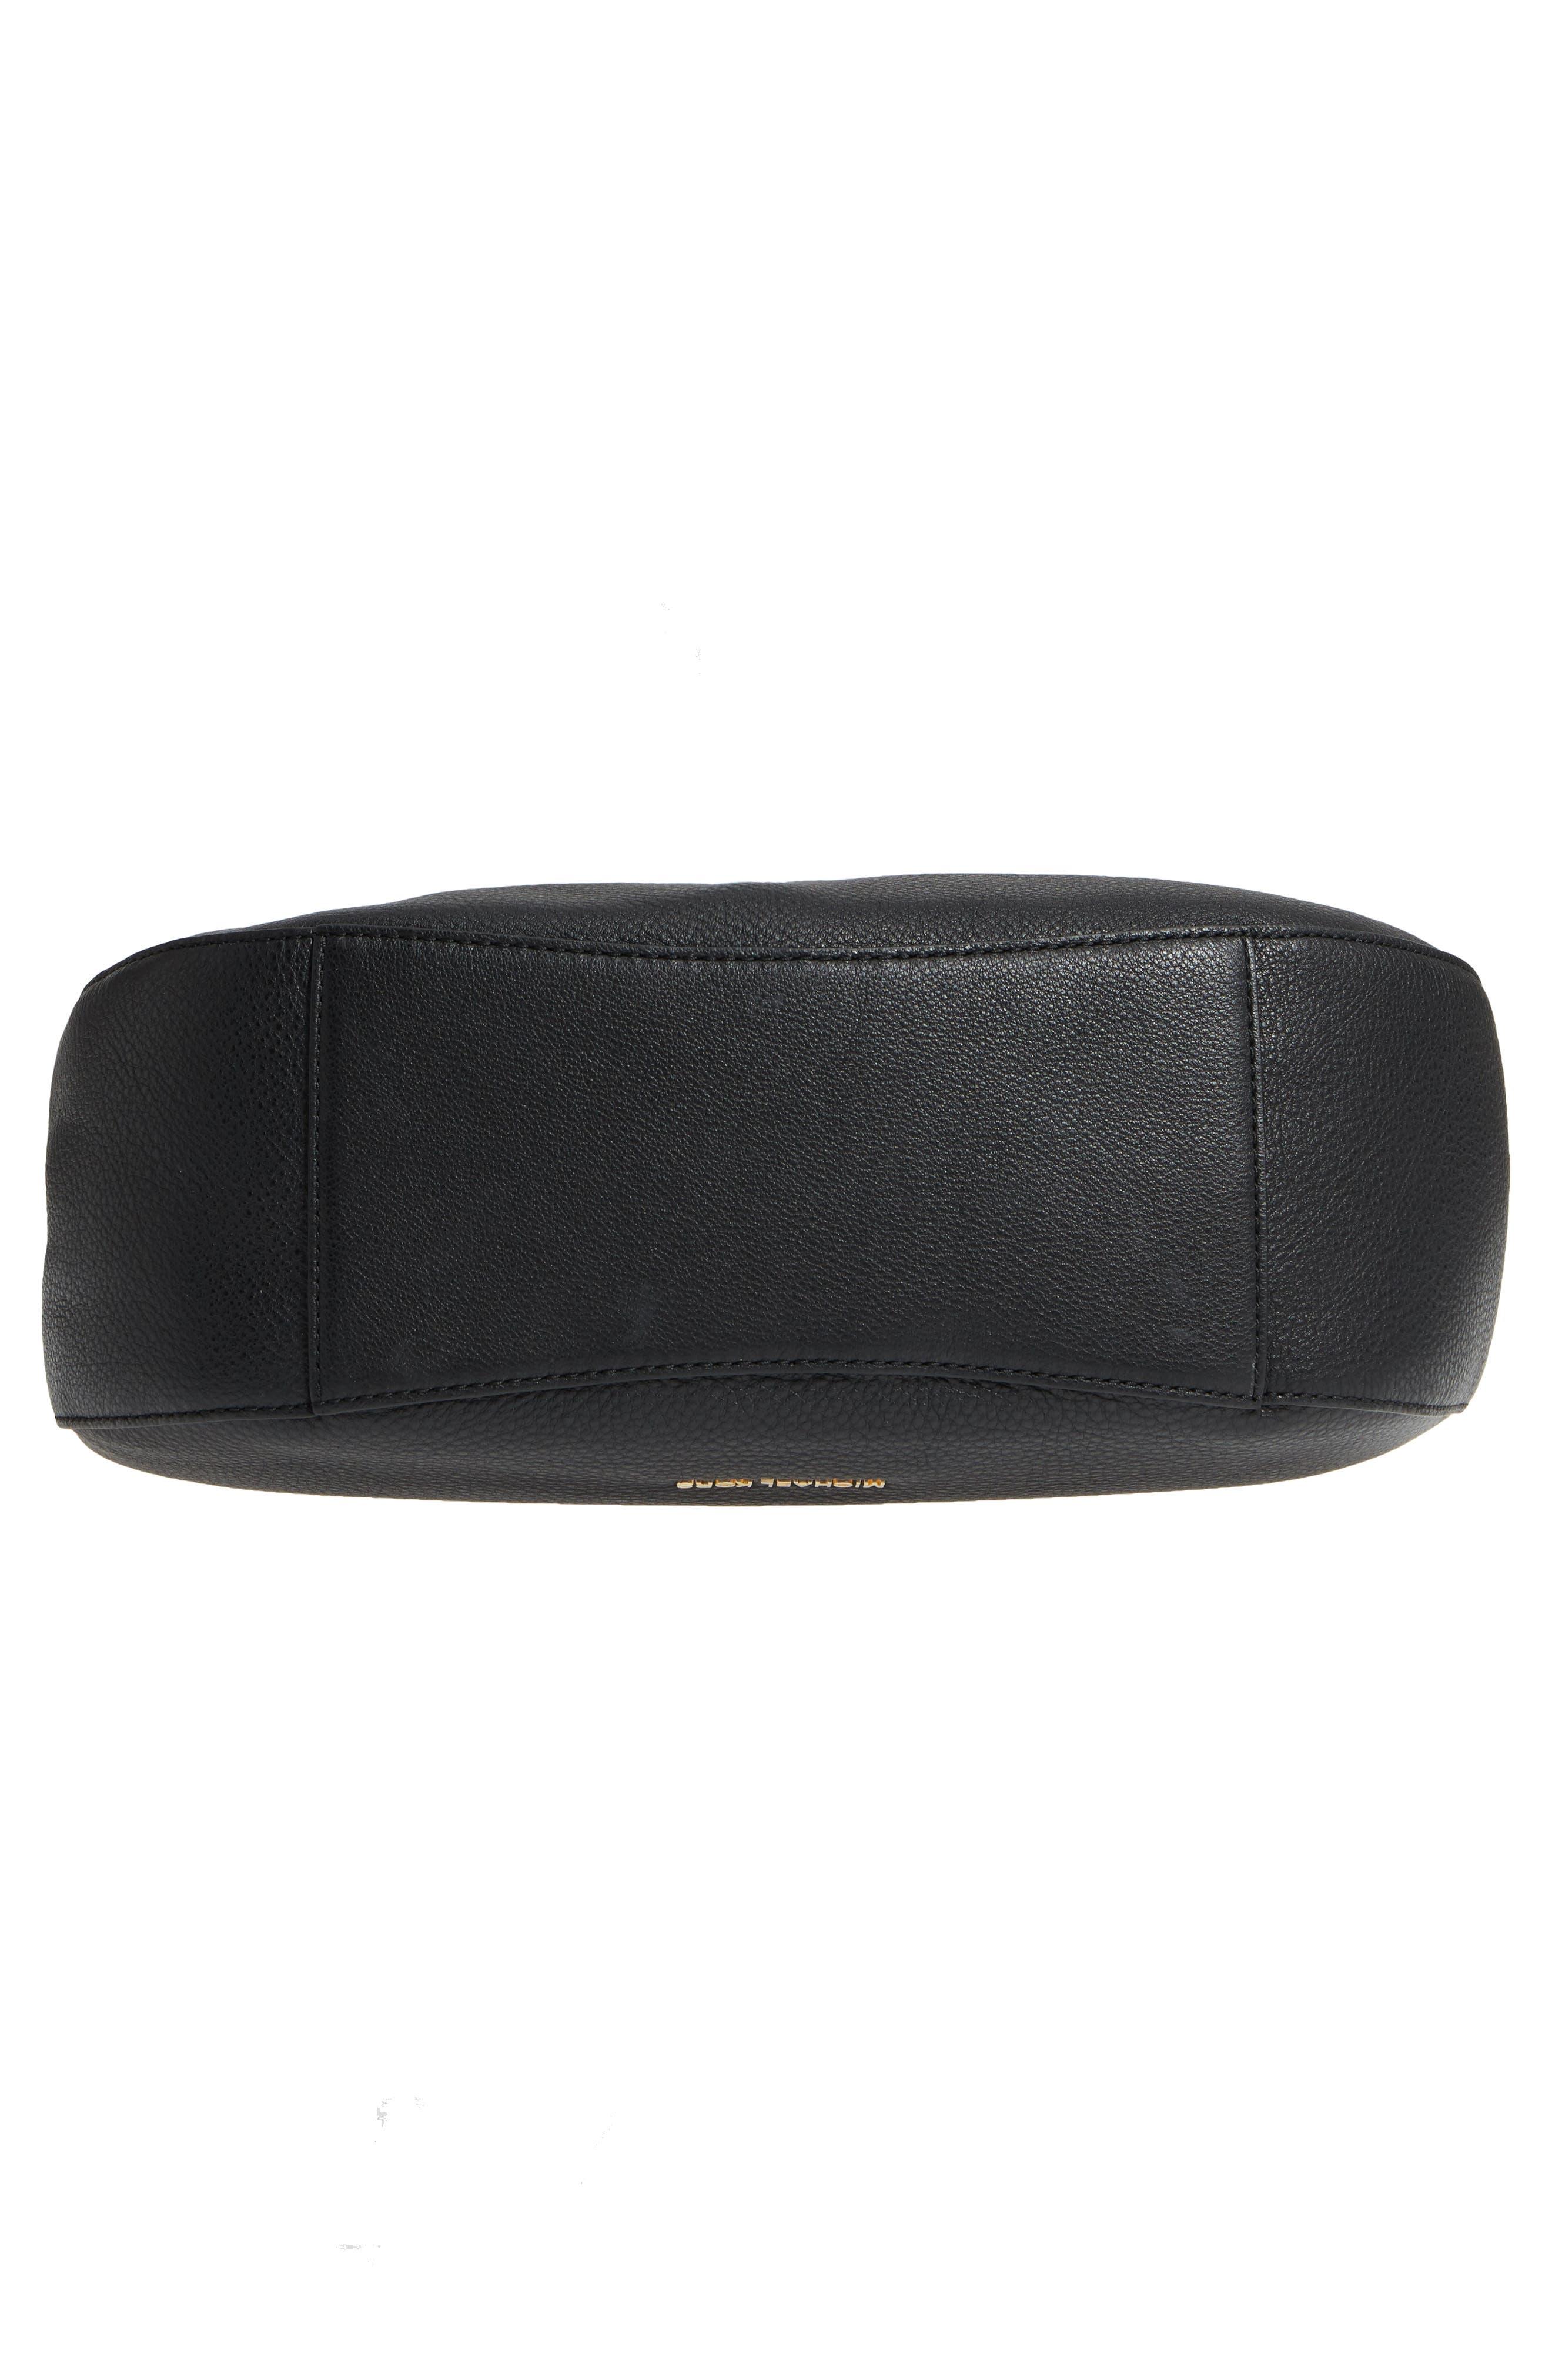 Fulton Leather Hobo,                             Alternate thumbnail 6, color,                             Black